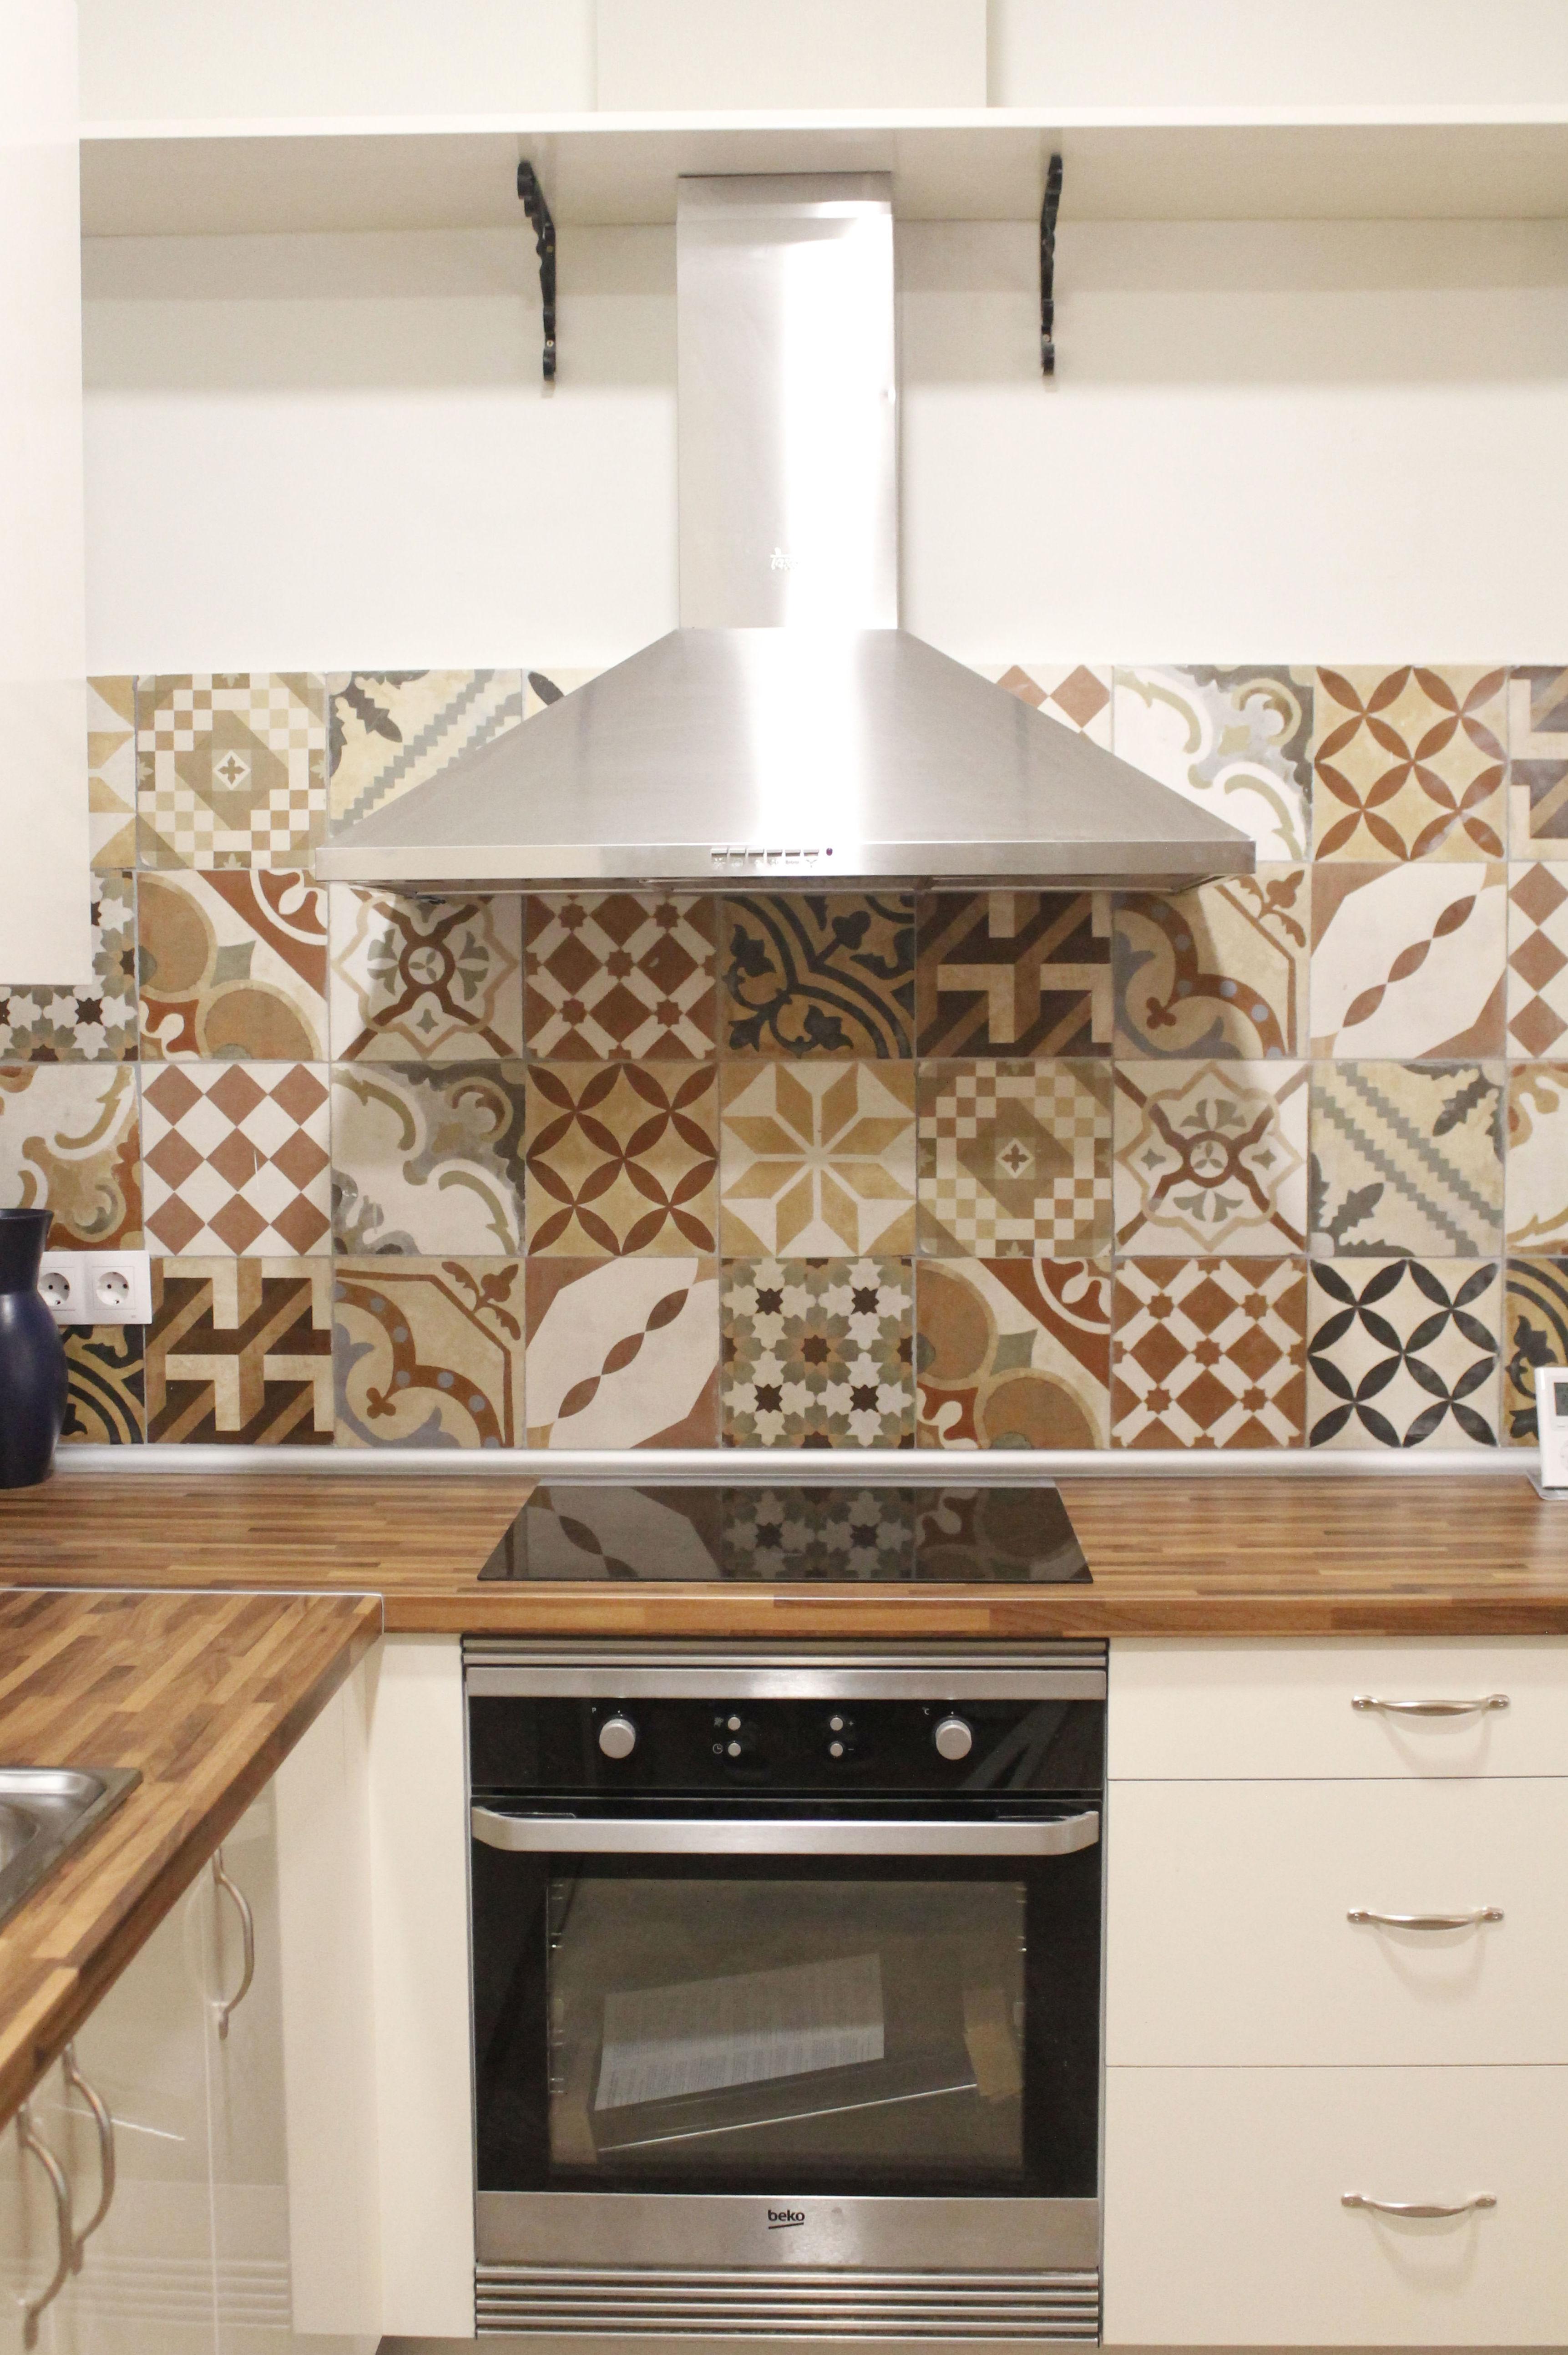 da un nuevo estilo a tu cocina